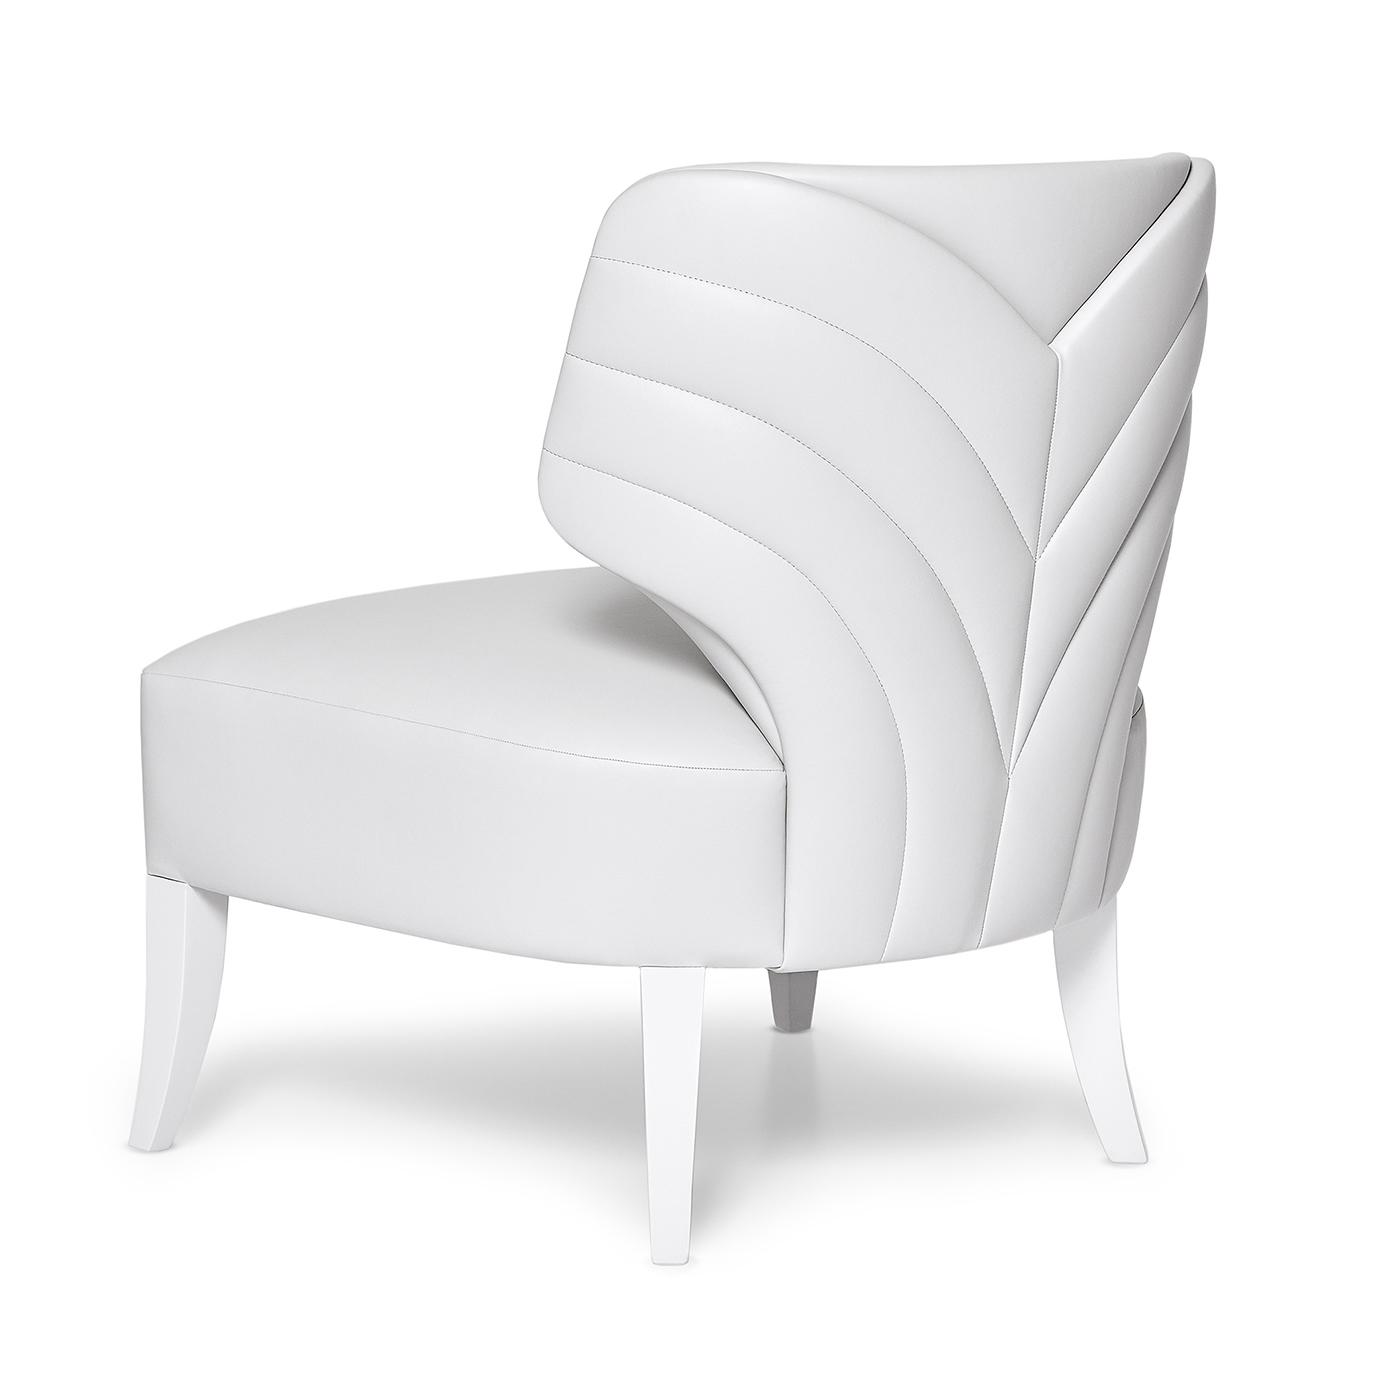 Munna (RU) Кресло Melody от португальского бренда Munna